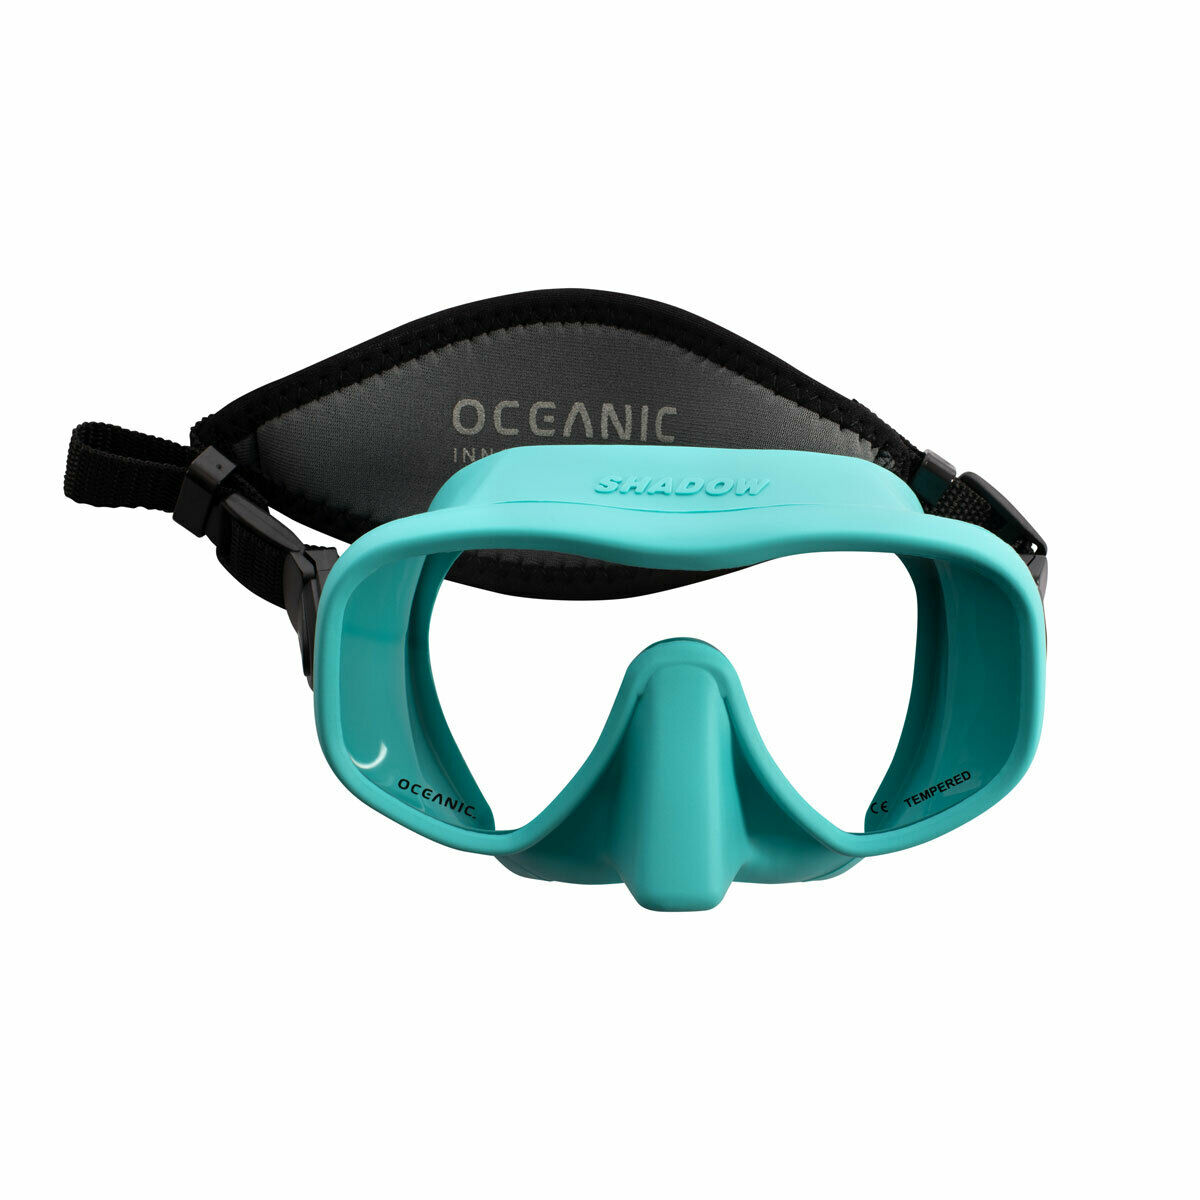 Oceanic Shadow Mask Scuba Snorkeling Diving Freedive Sea bluee 05.4000.89